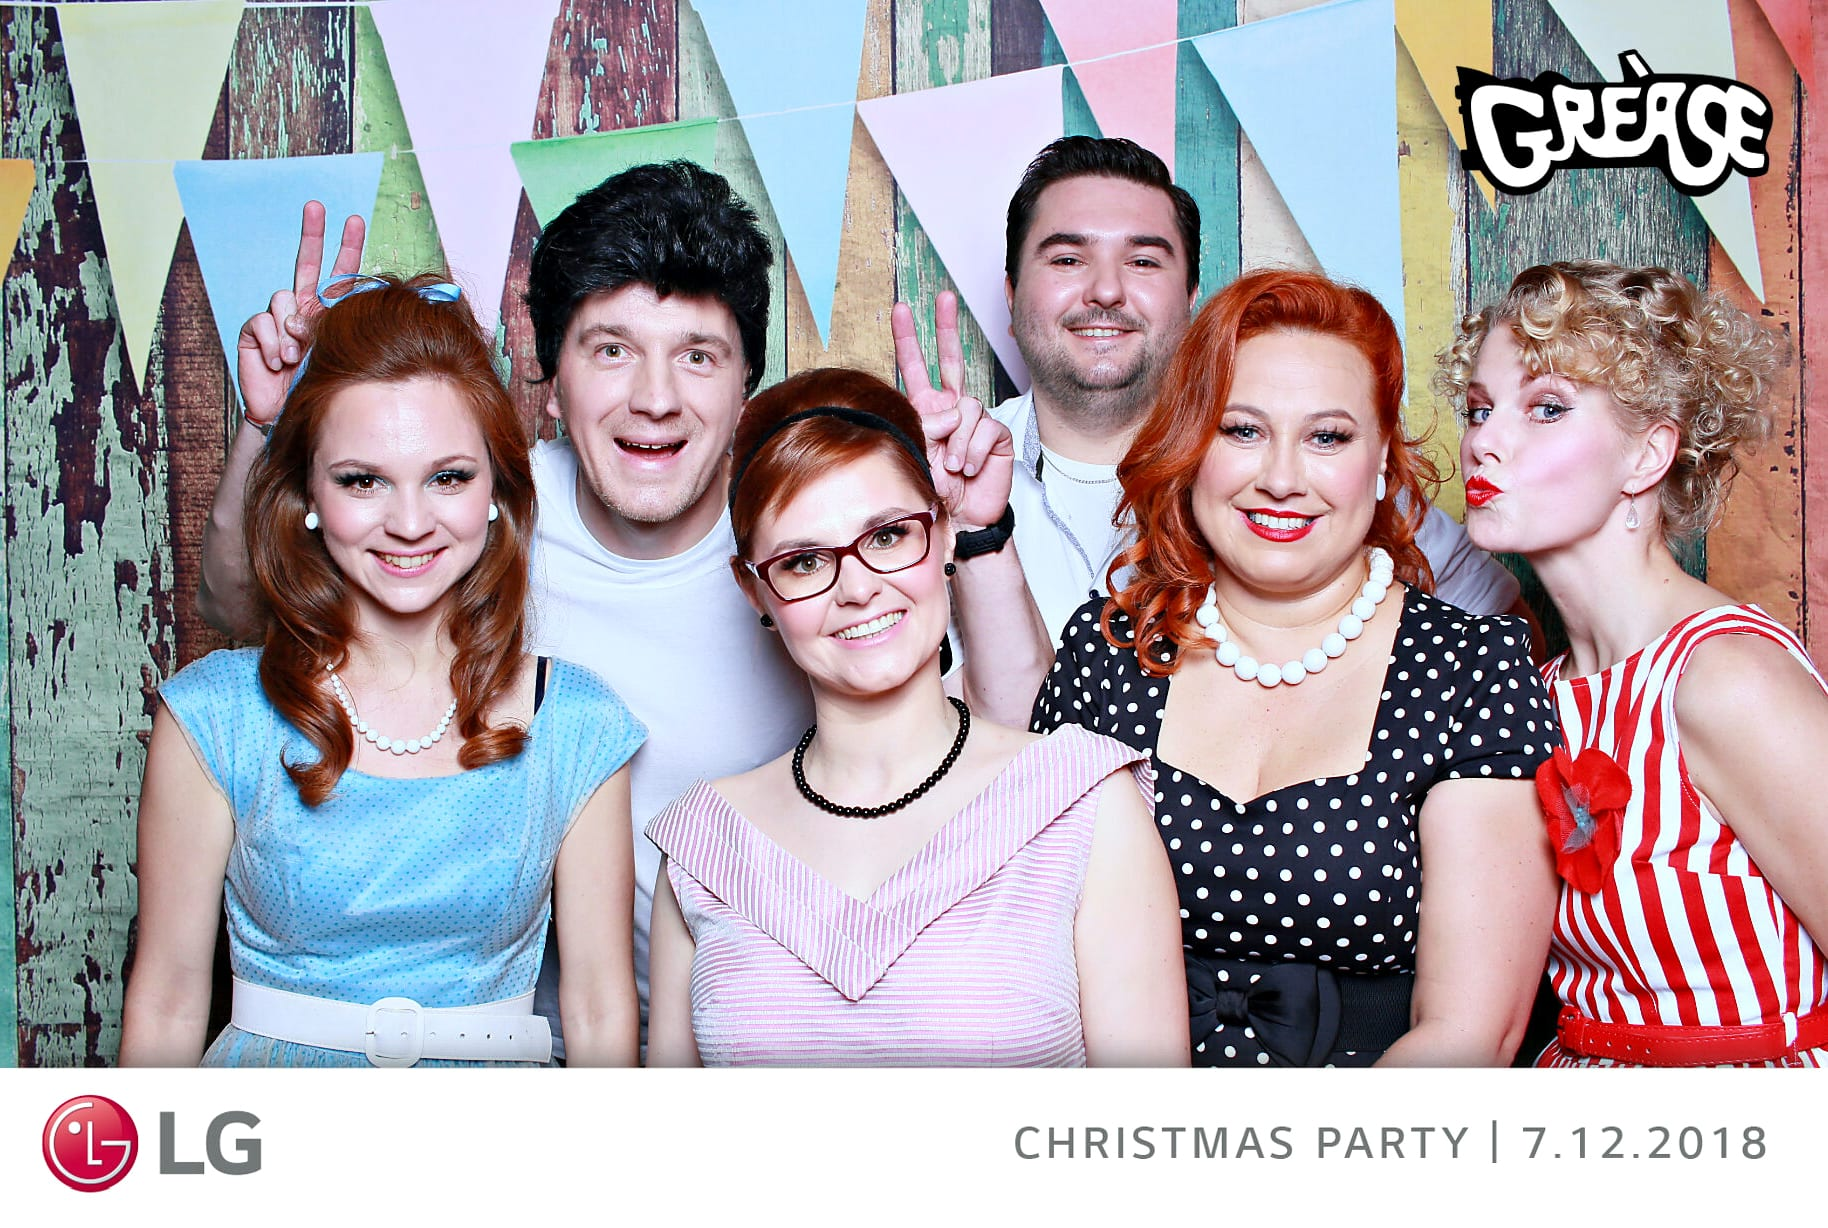 fotokoutek-lg-christmas-party-7-12-2018-537292